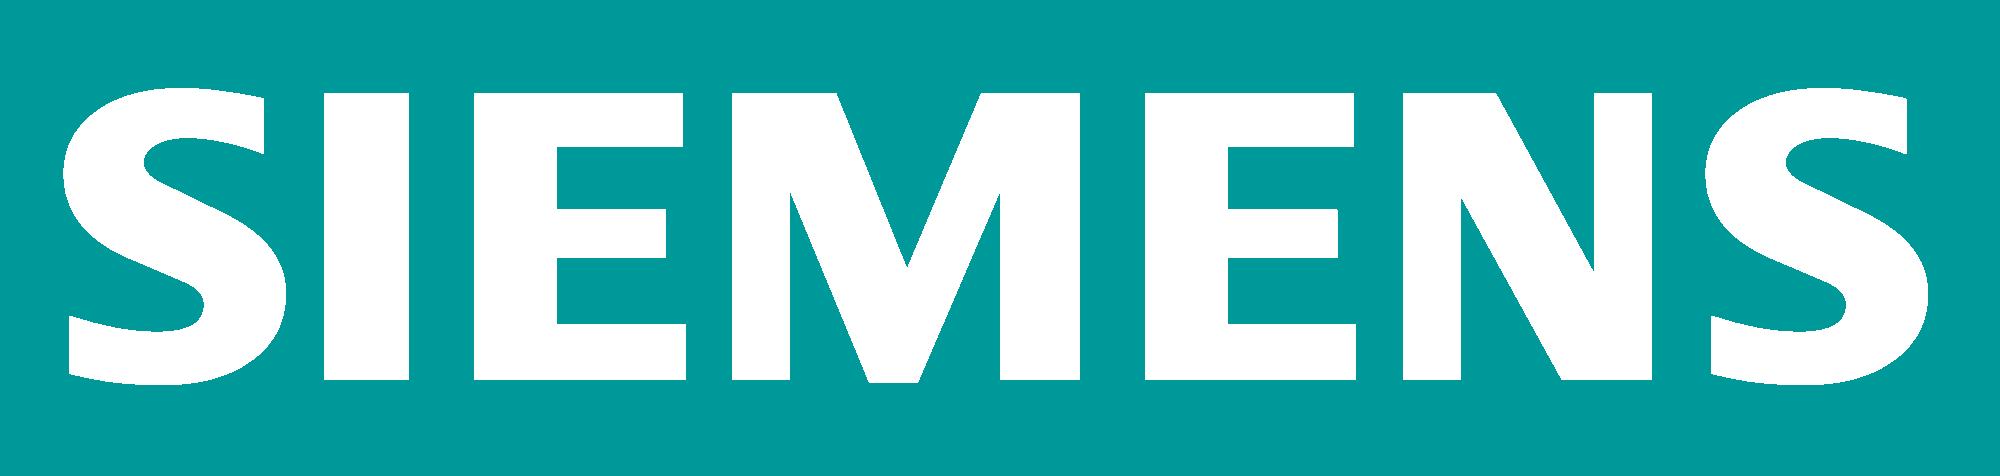 Siemens invert logo - Siemens PNG